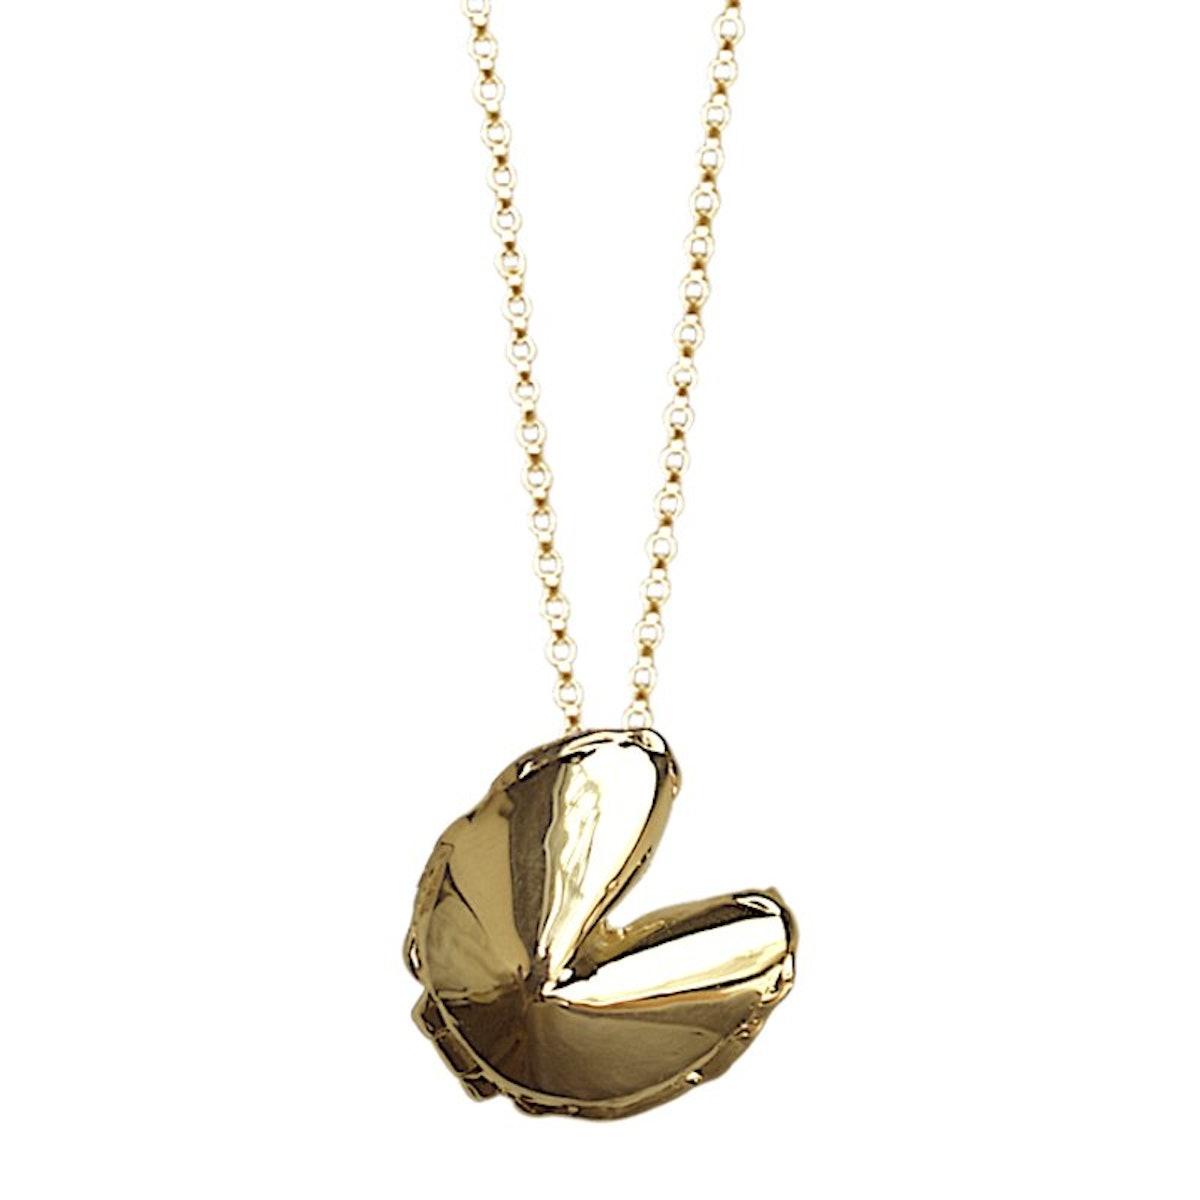 Fortune Cookie Locket Necklace